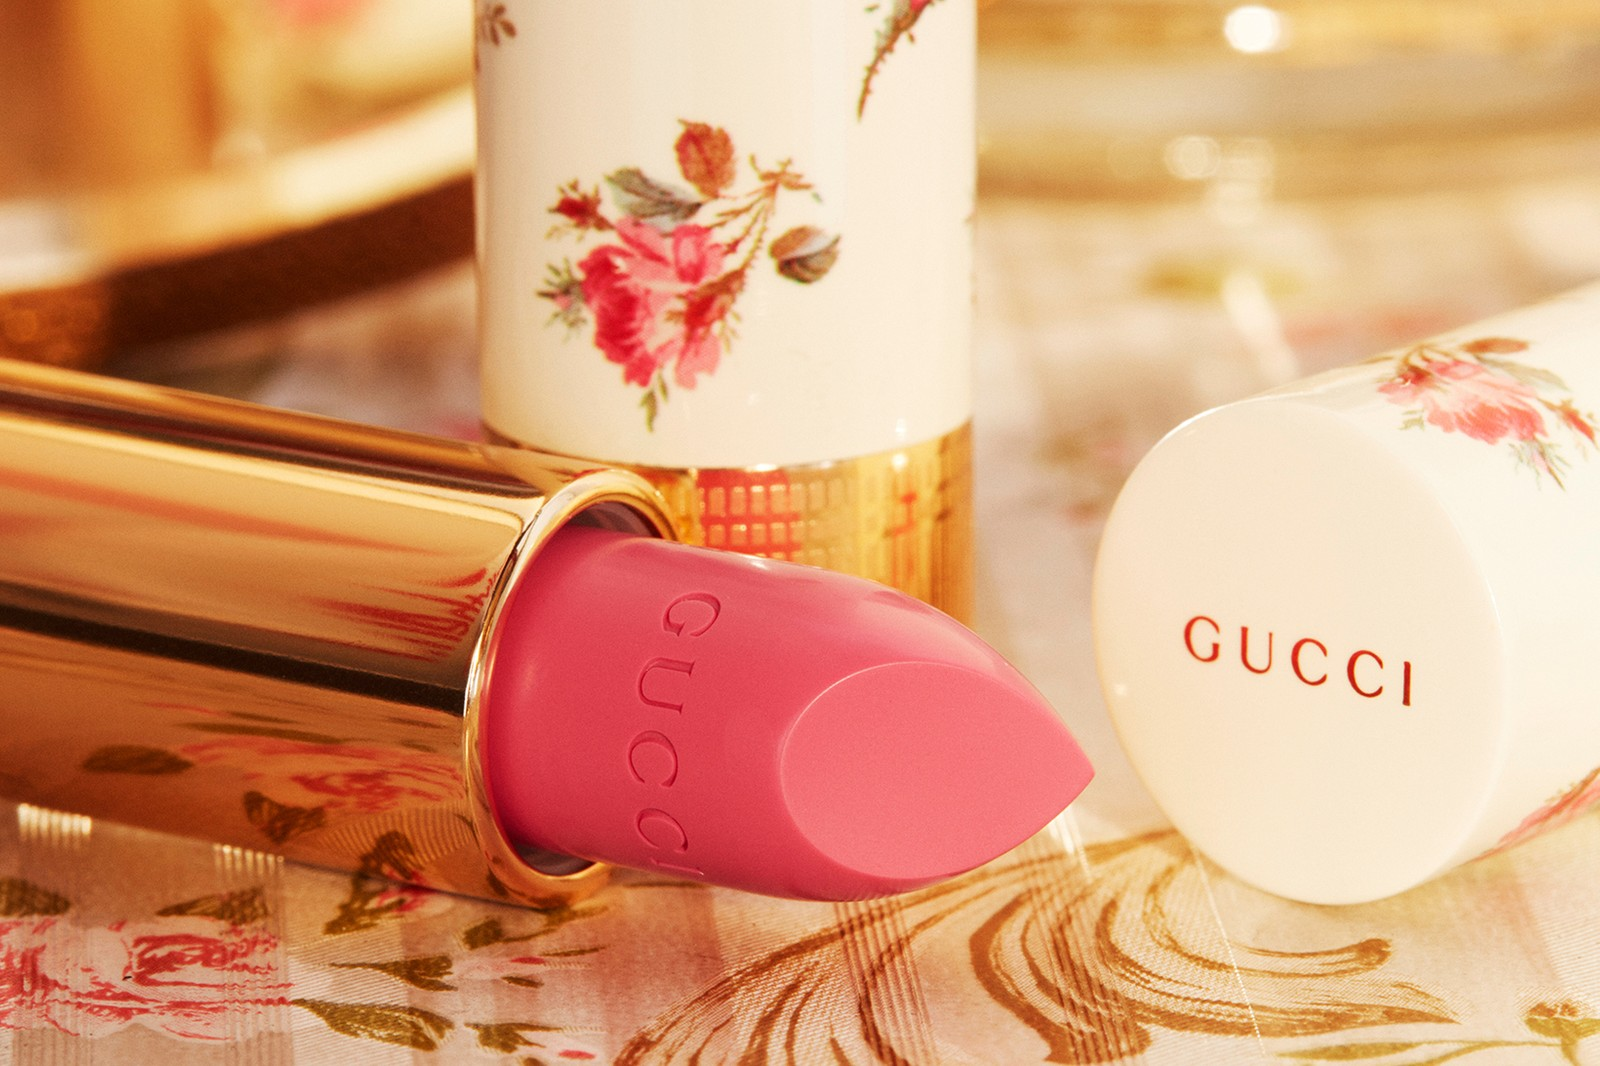 gucci beauty alessandro michele thomas de kluyver global makeup artist lipsticks beauty